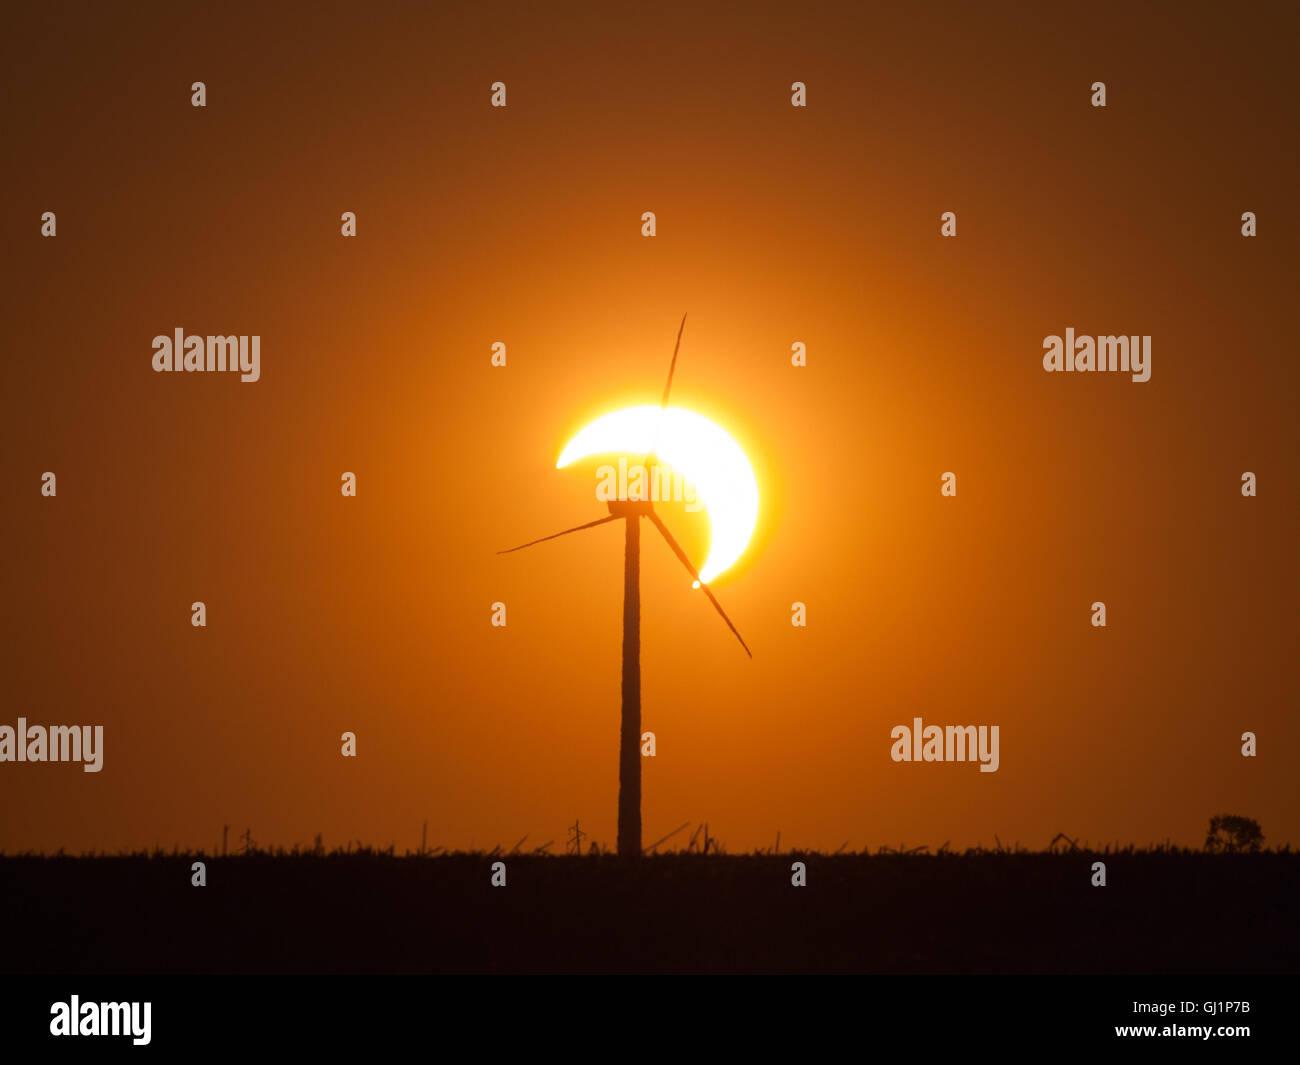 Wind Turbine and Solar Eclipse - Stock Image